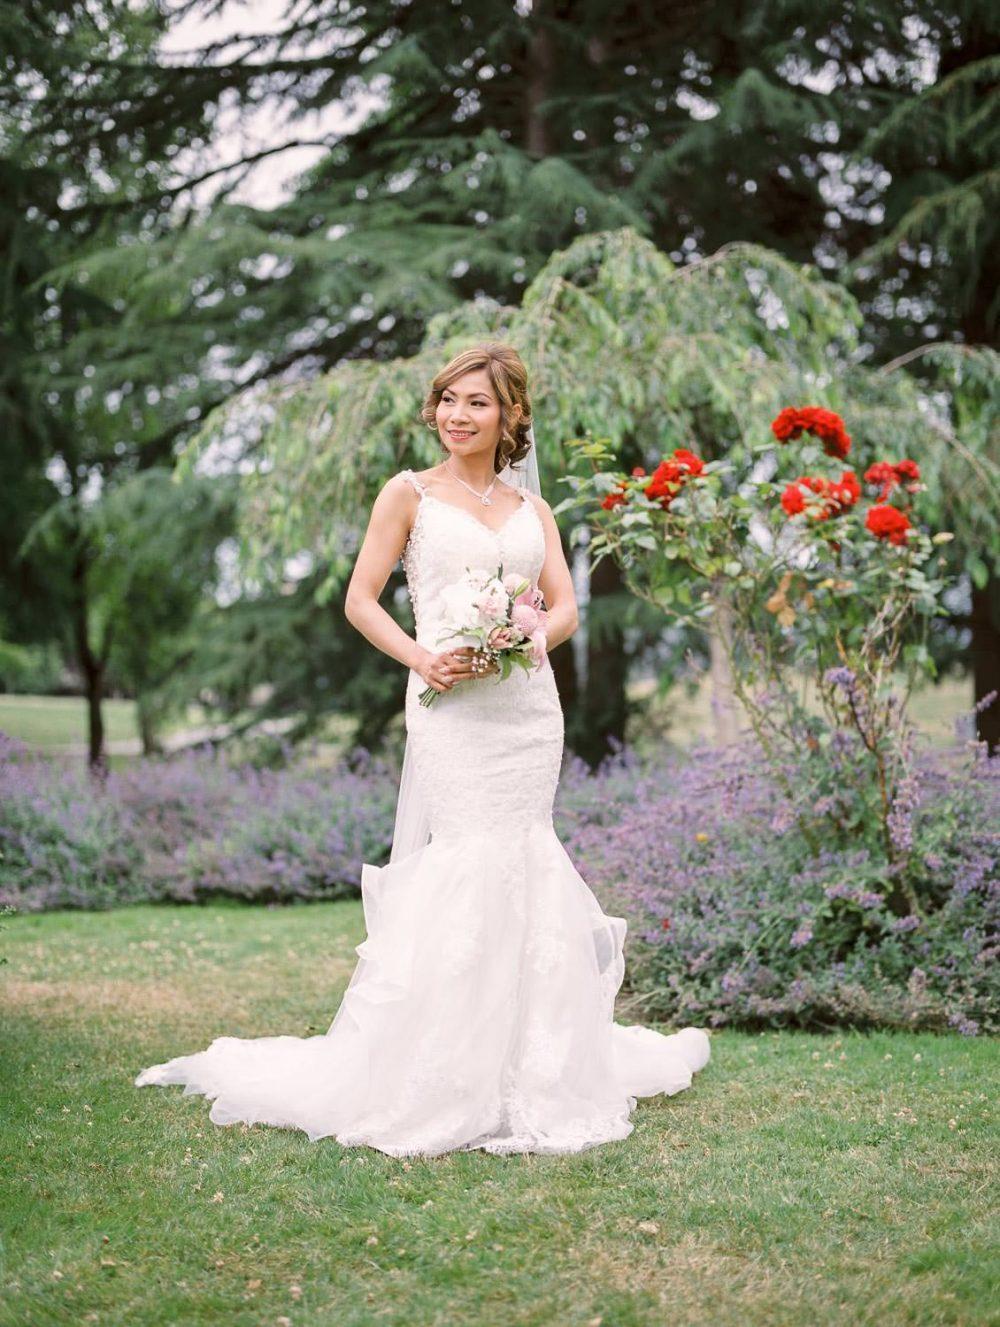 Bride posing in Minoru park | Vancouver wedding film photographer